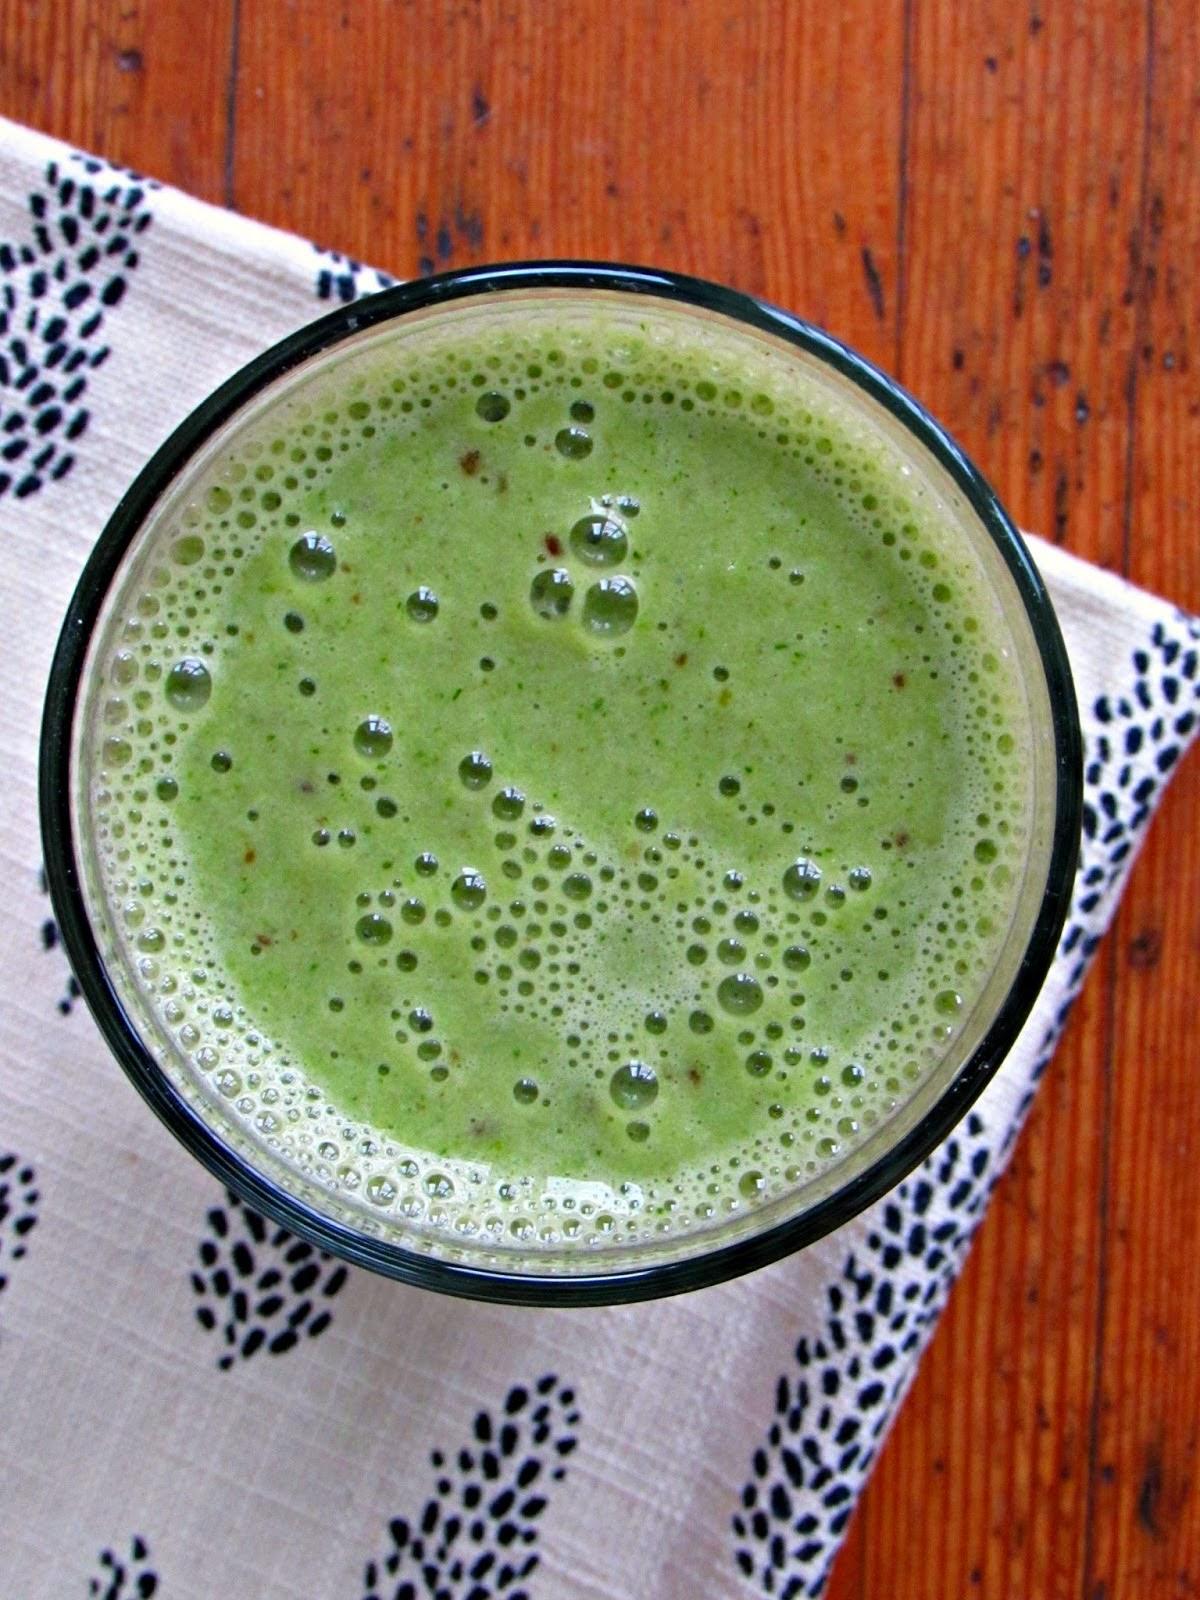 http://www.chicagojogger.com/2015/03/healthy-mint-breakfast-milkshake.html